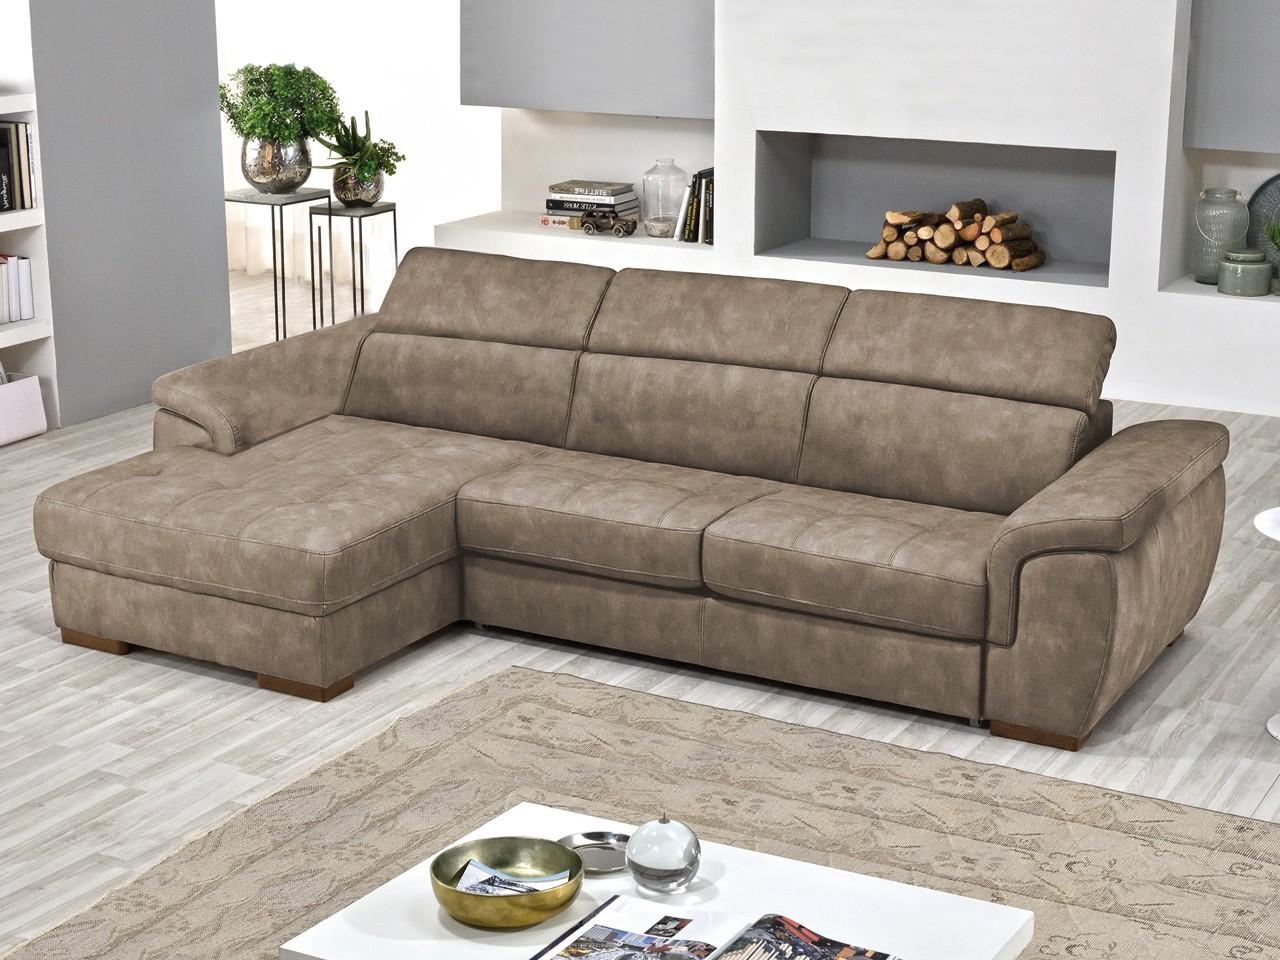 Dicoro sofas Ipdd sofas Baratos Y sofas Online Dicoro